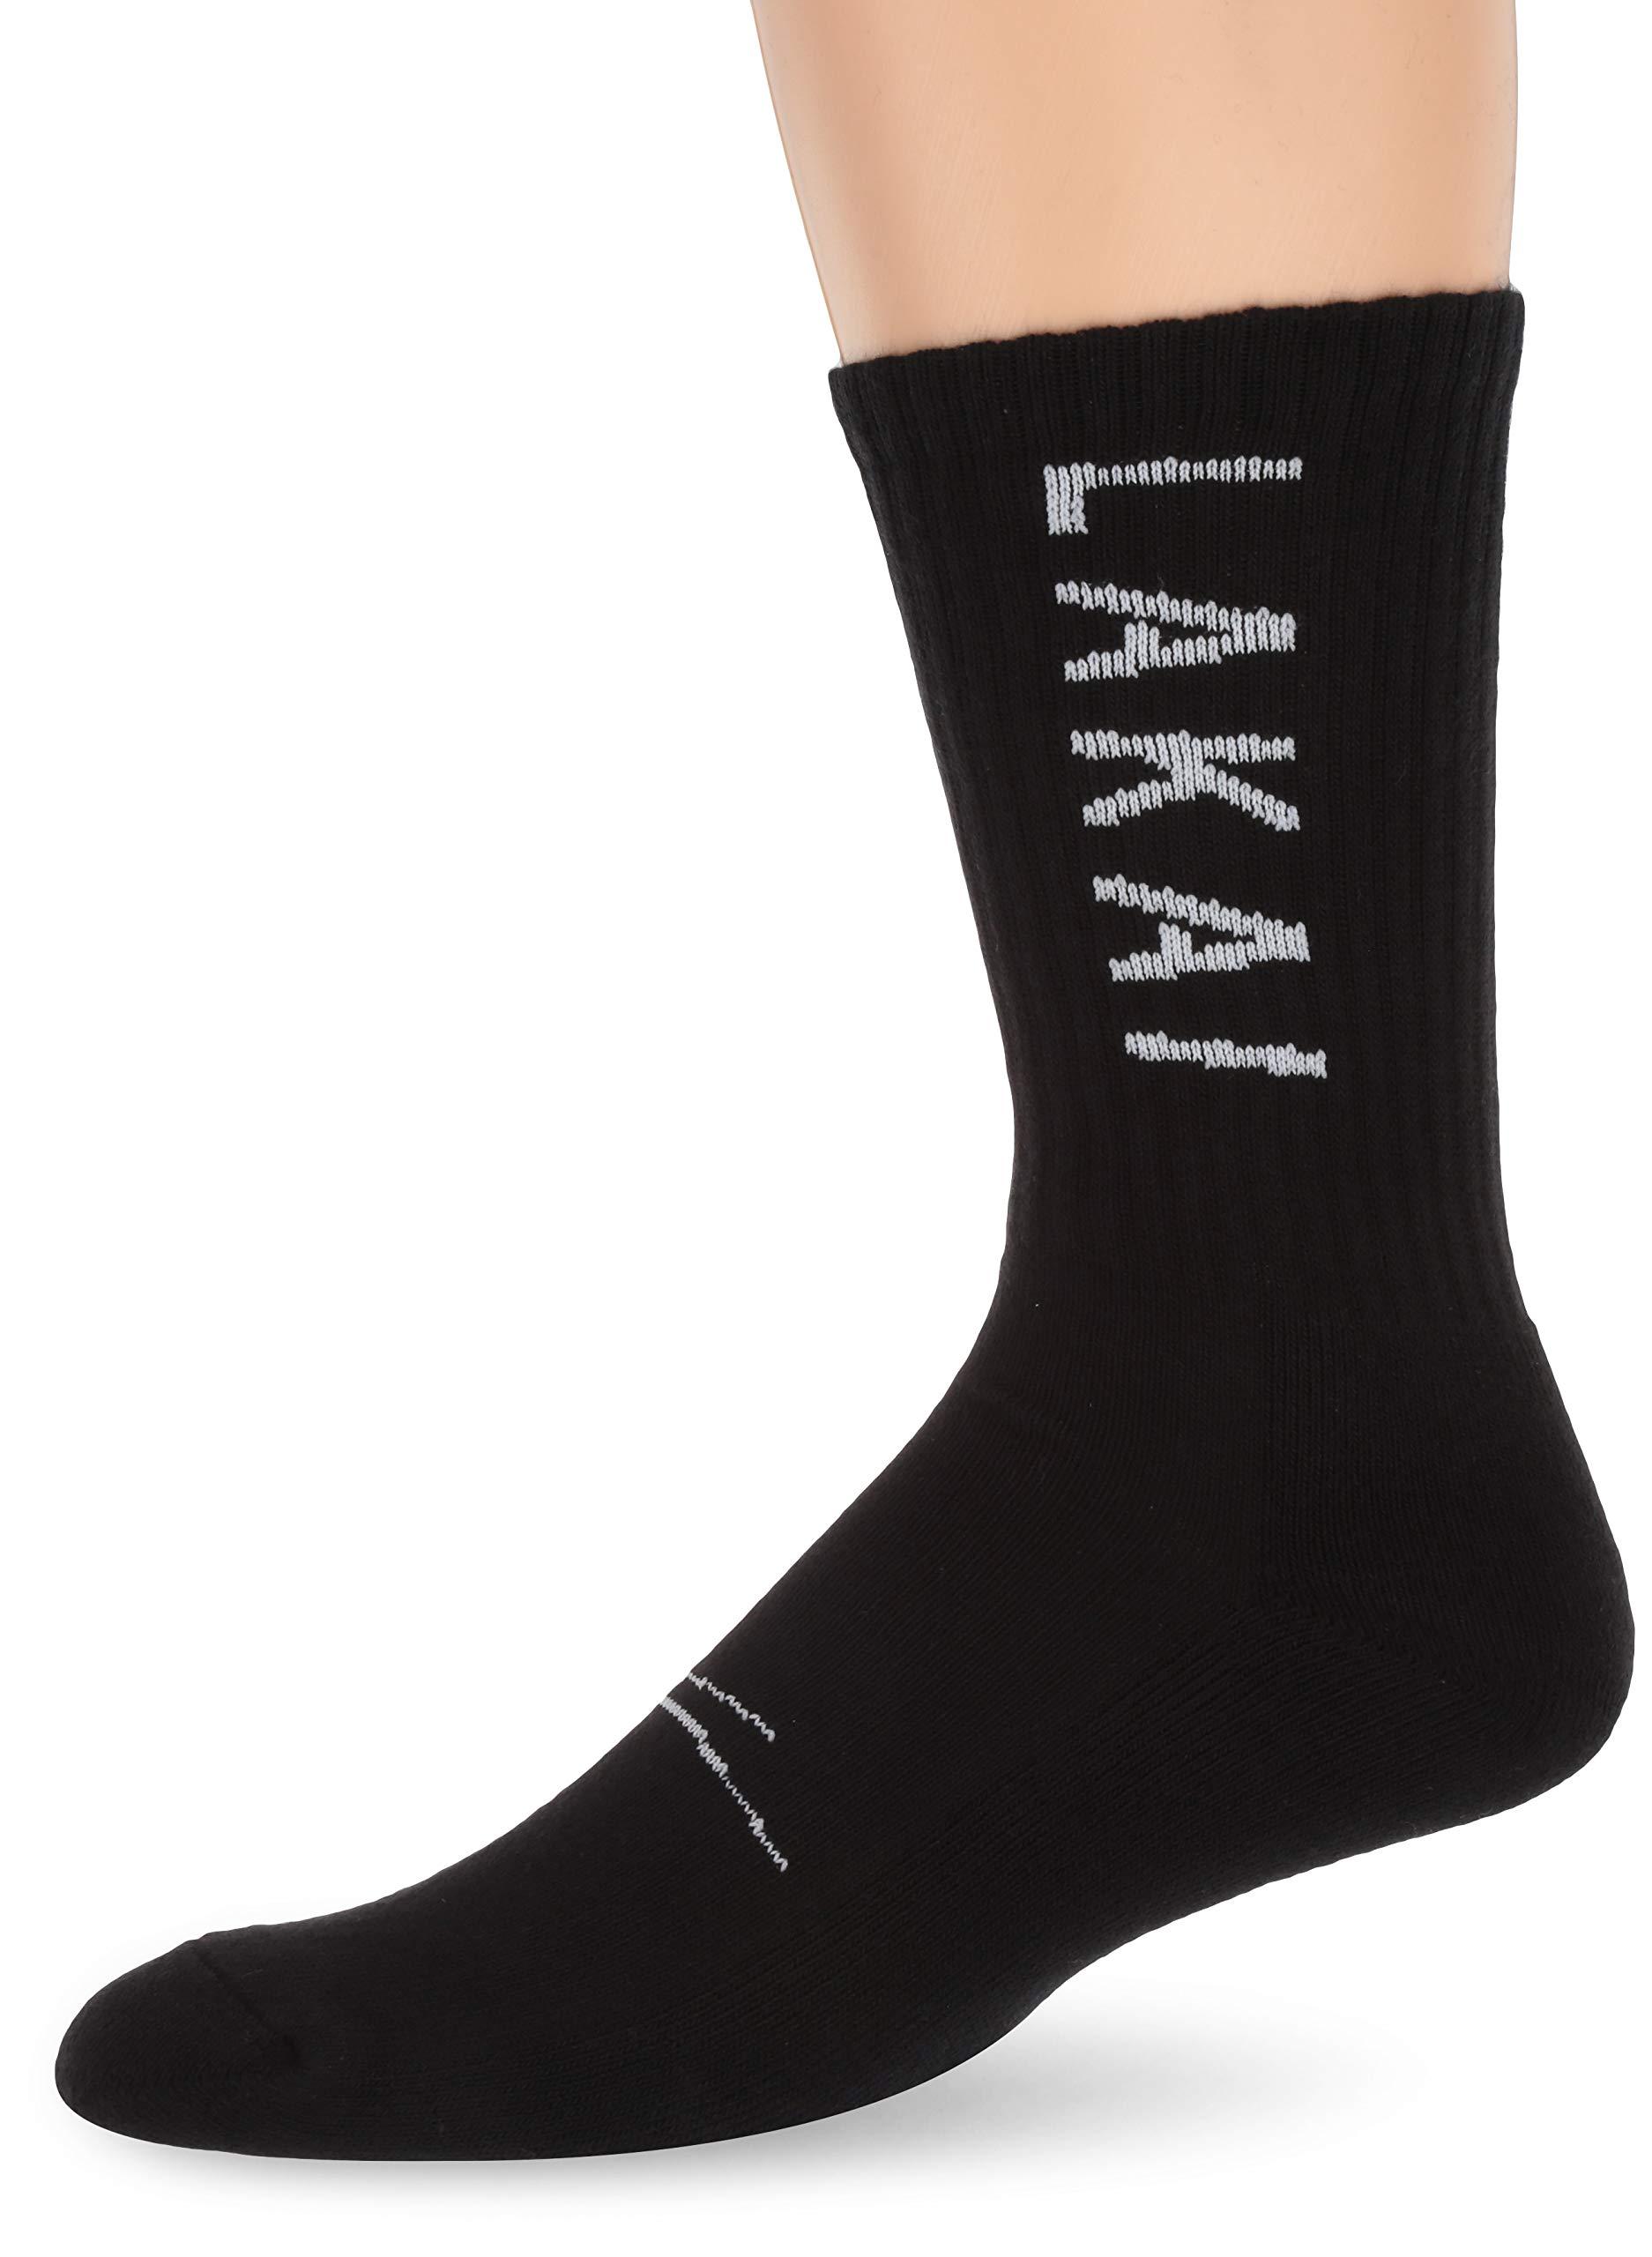 Lakai Unisex-Adult's Simple Crew Sock Black Size NS